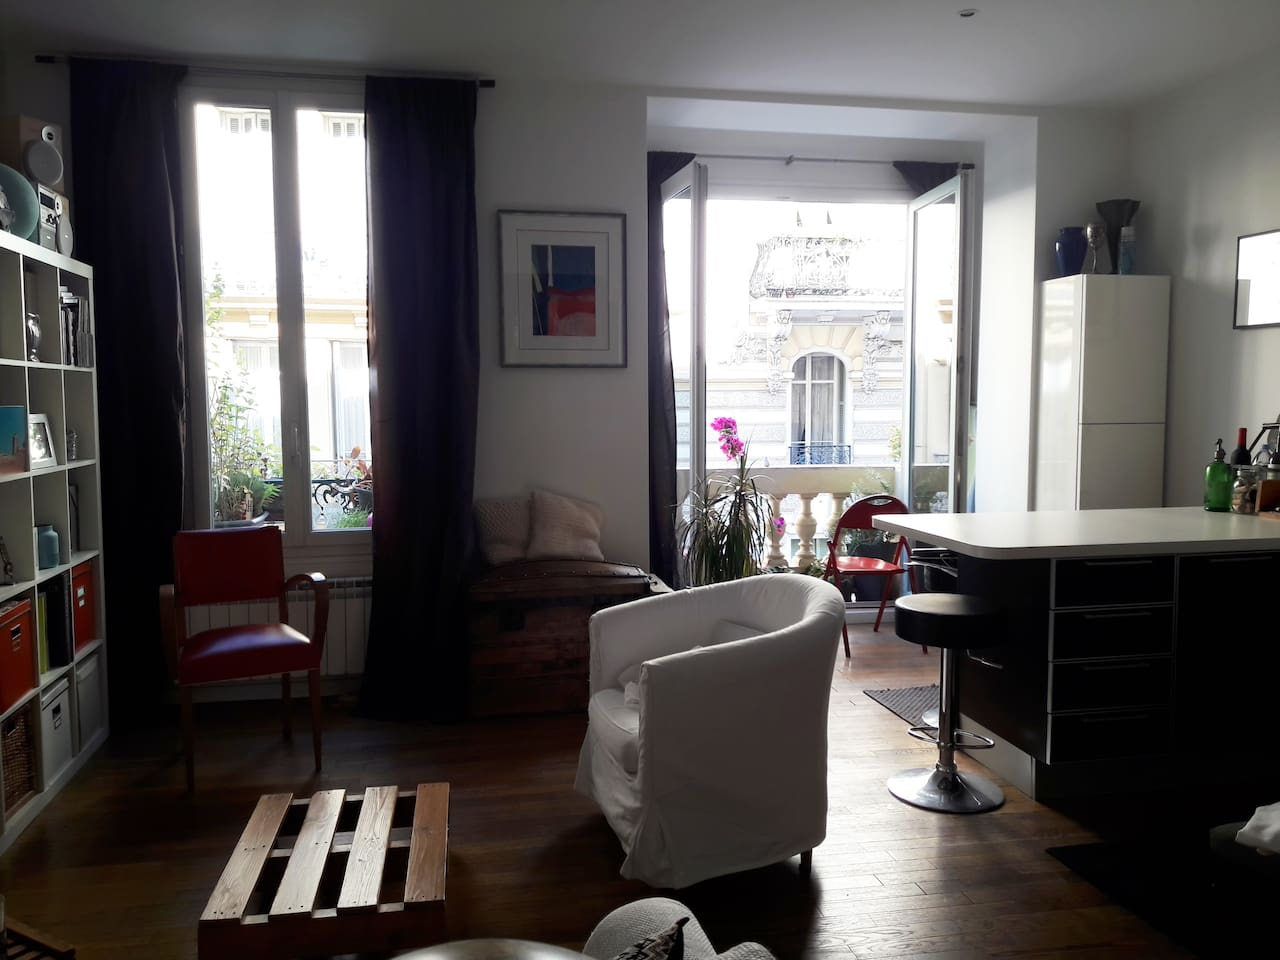 salon + cuisine | living room + kitchen